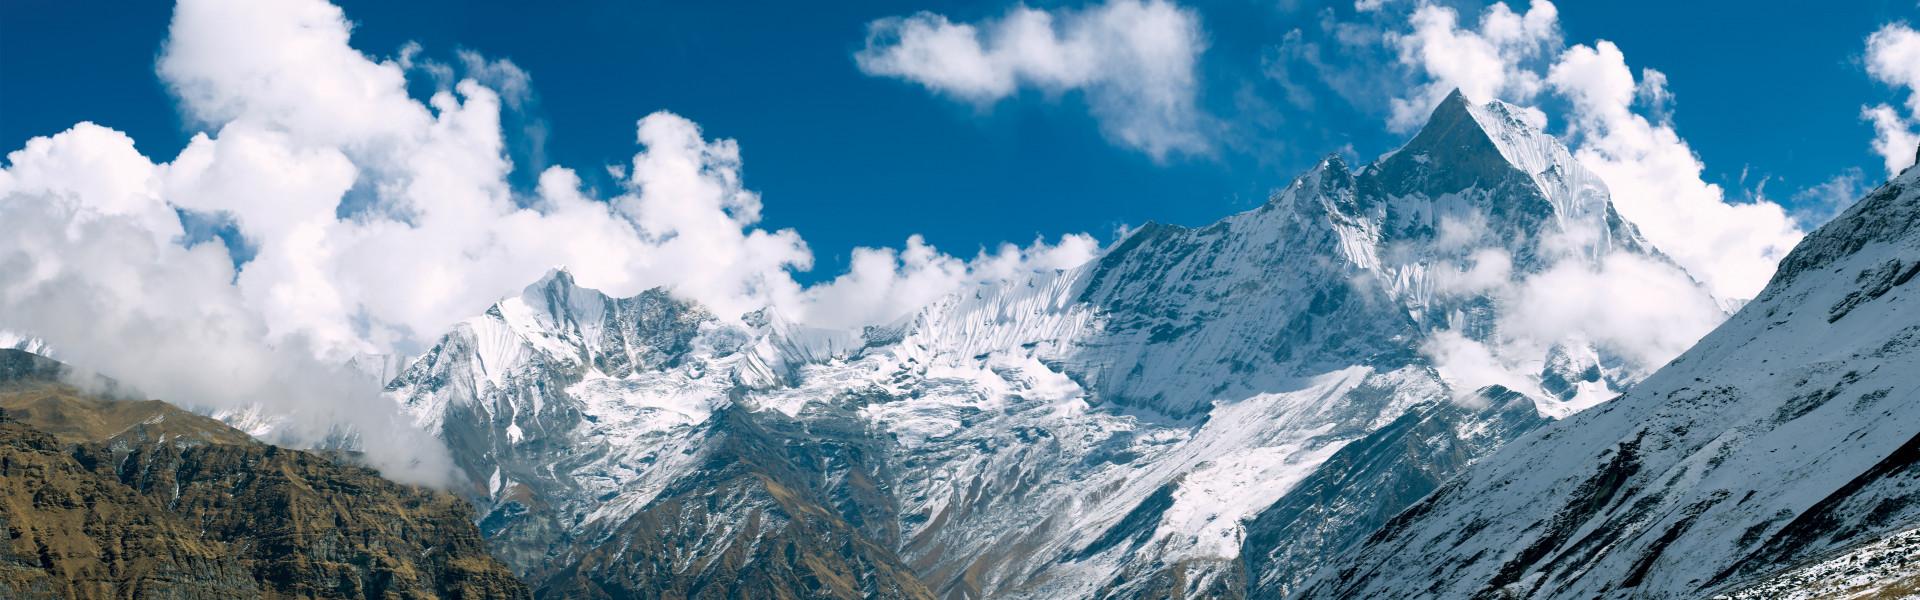 Destination image of Nepal